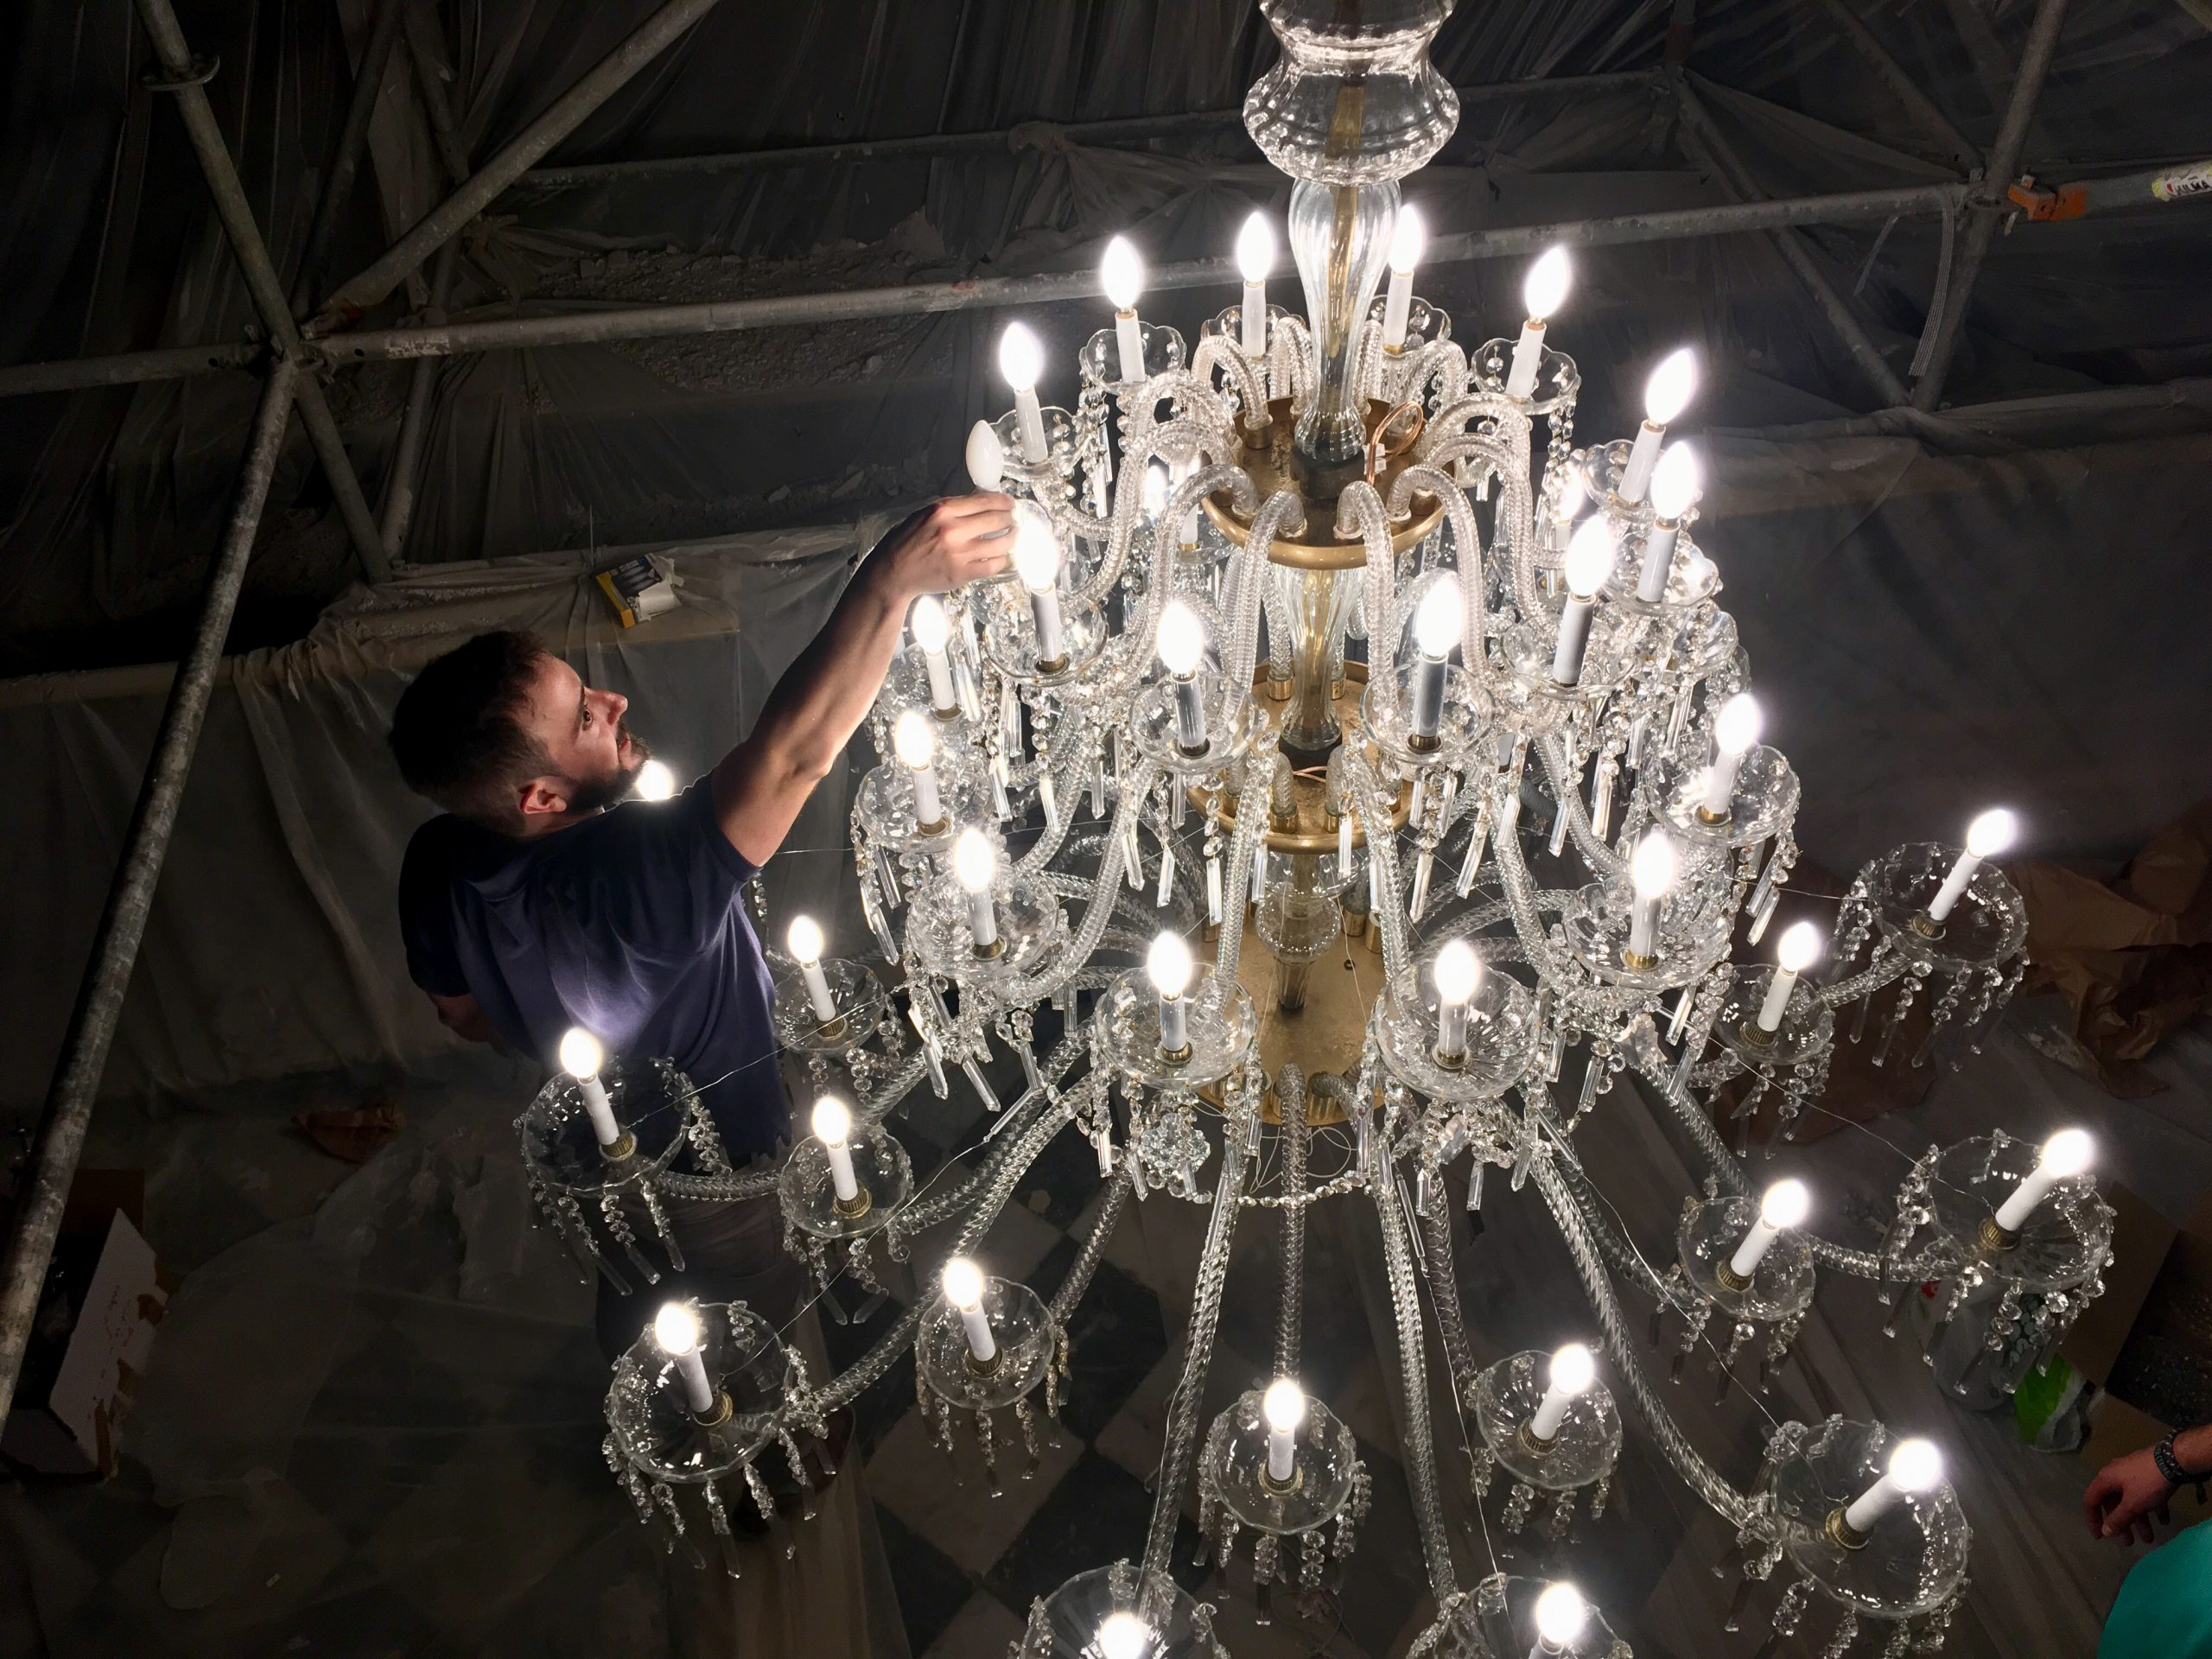 Servicio de restauración de lámparas